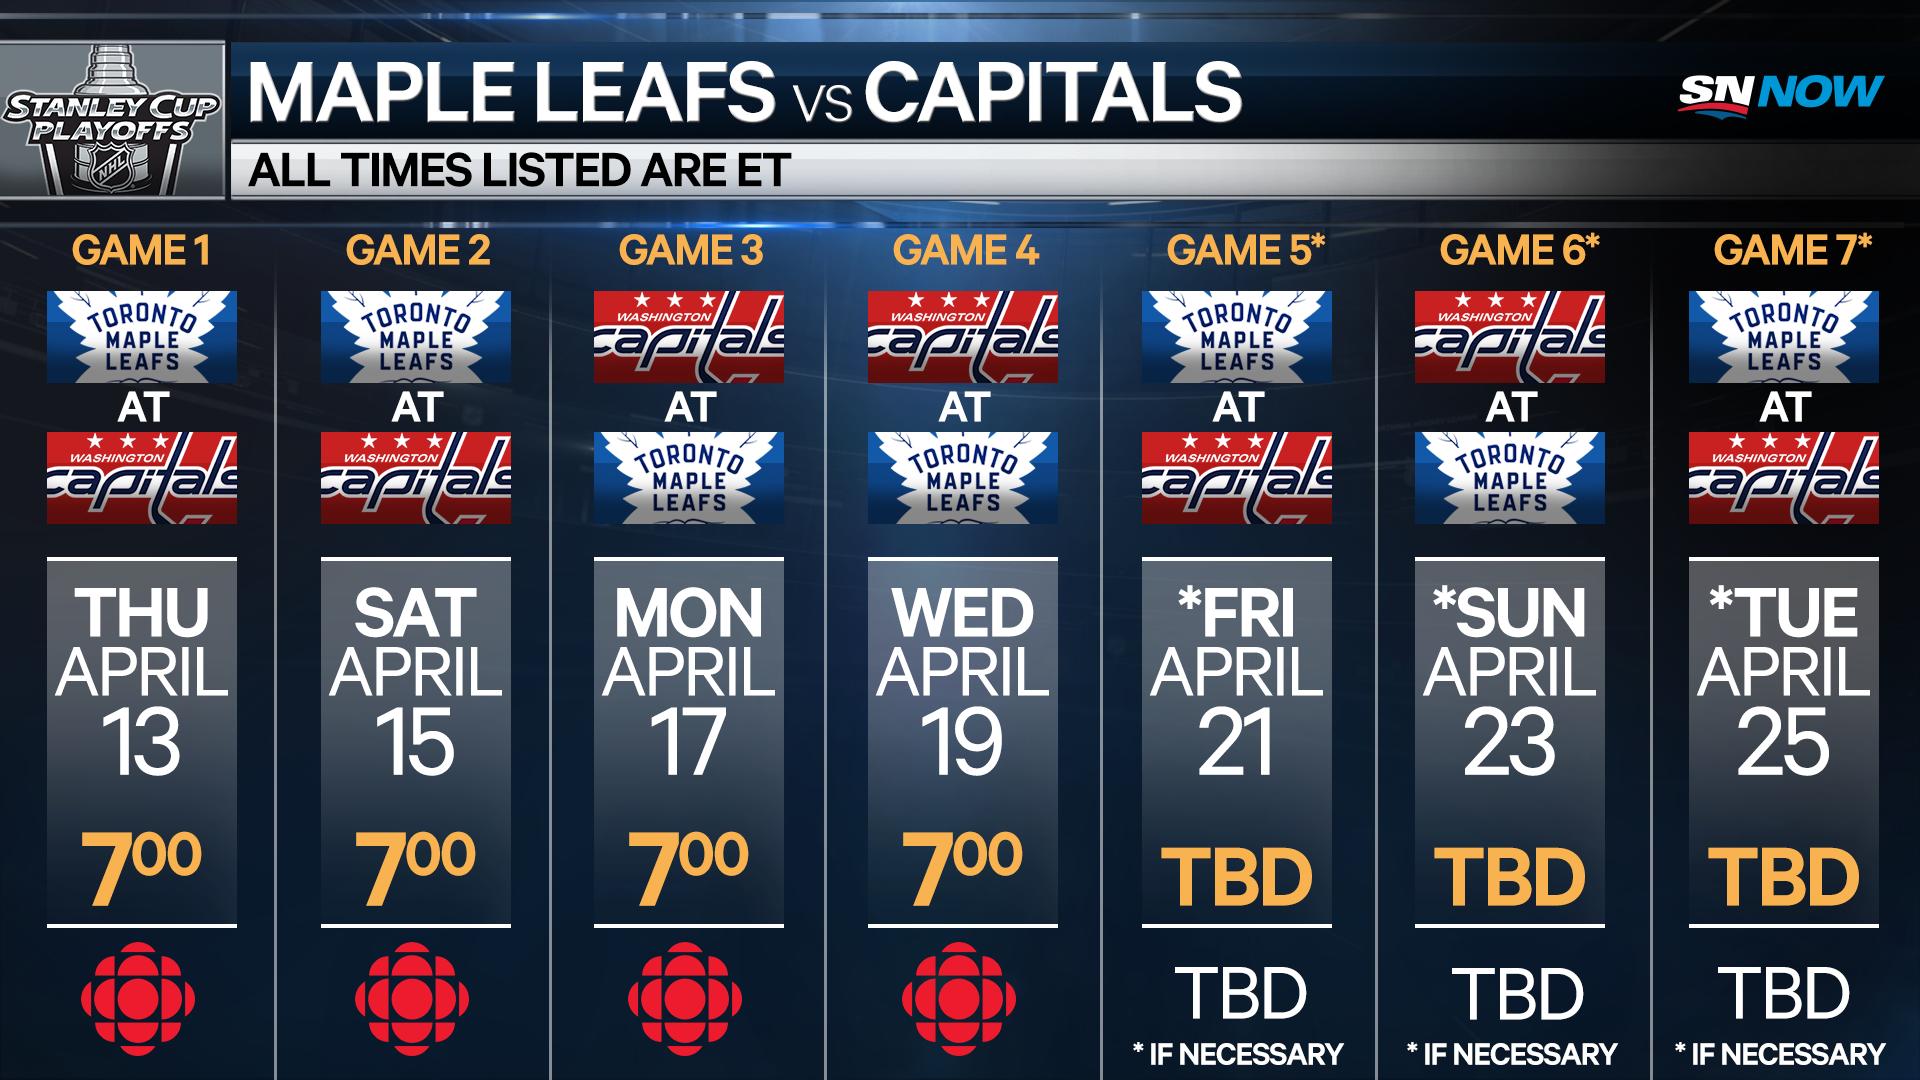 Sportsnet's Stanley Cup Playoffs First Round Broadcast